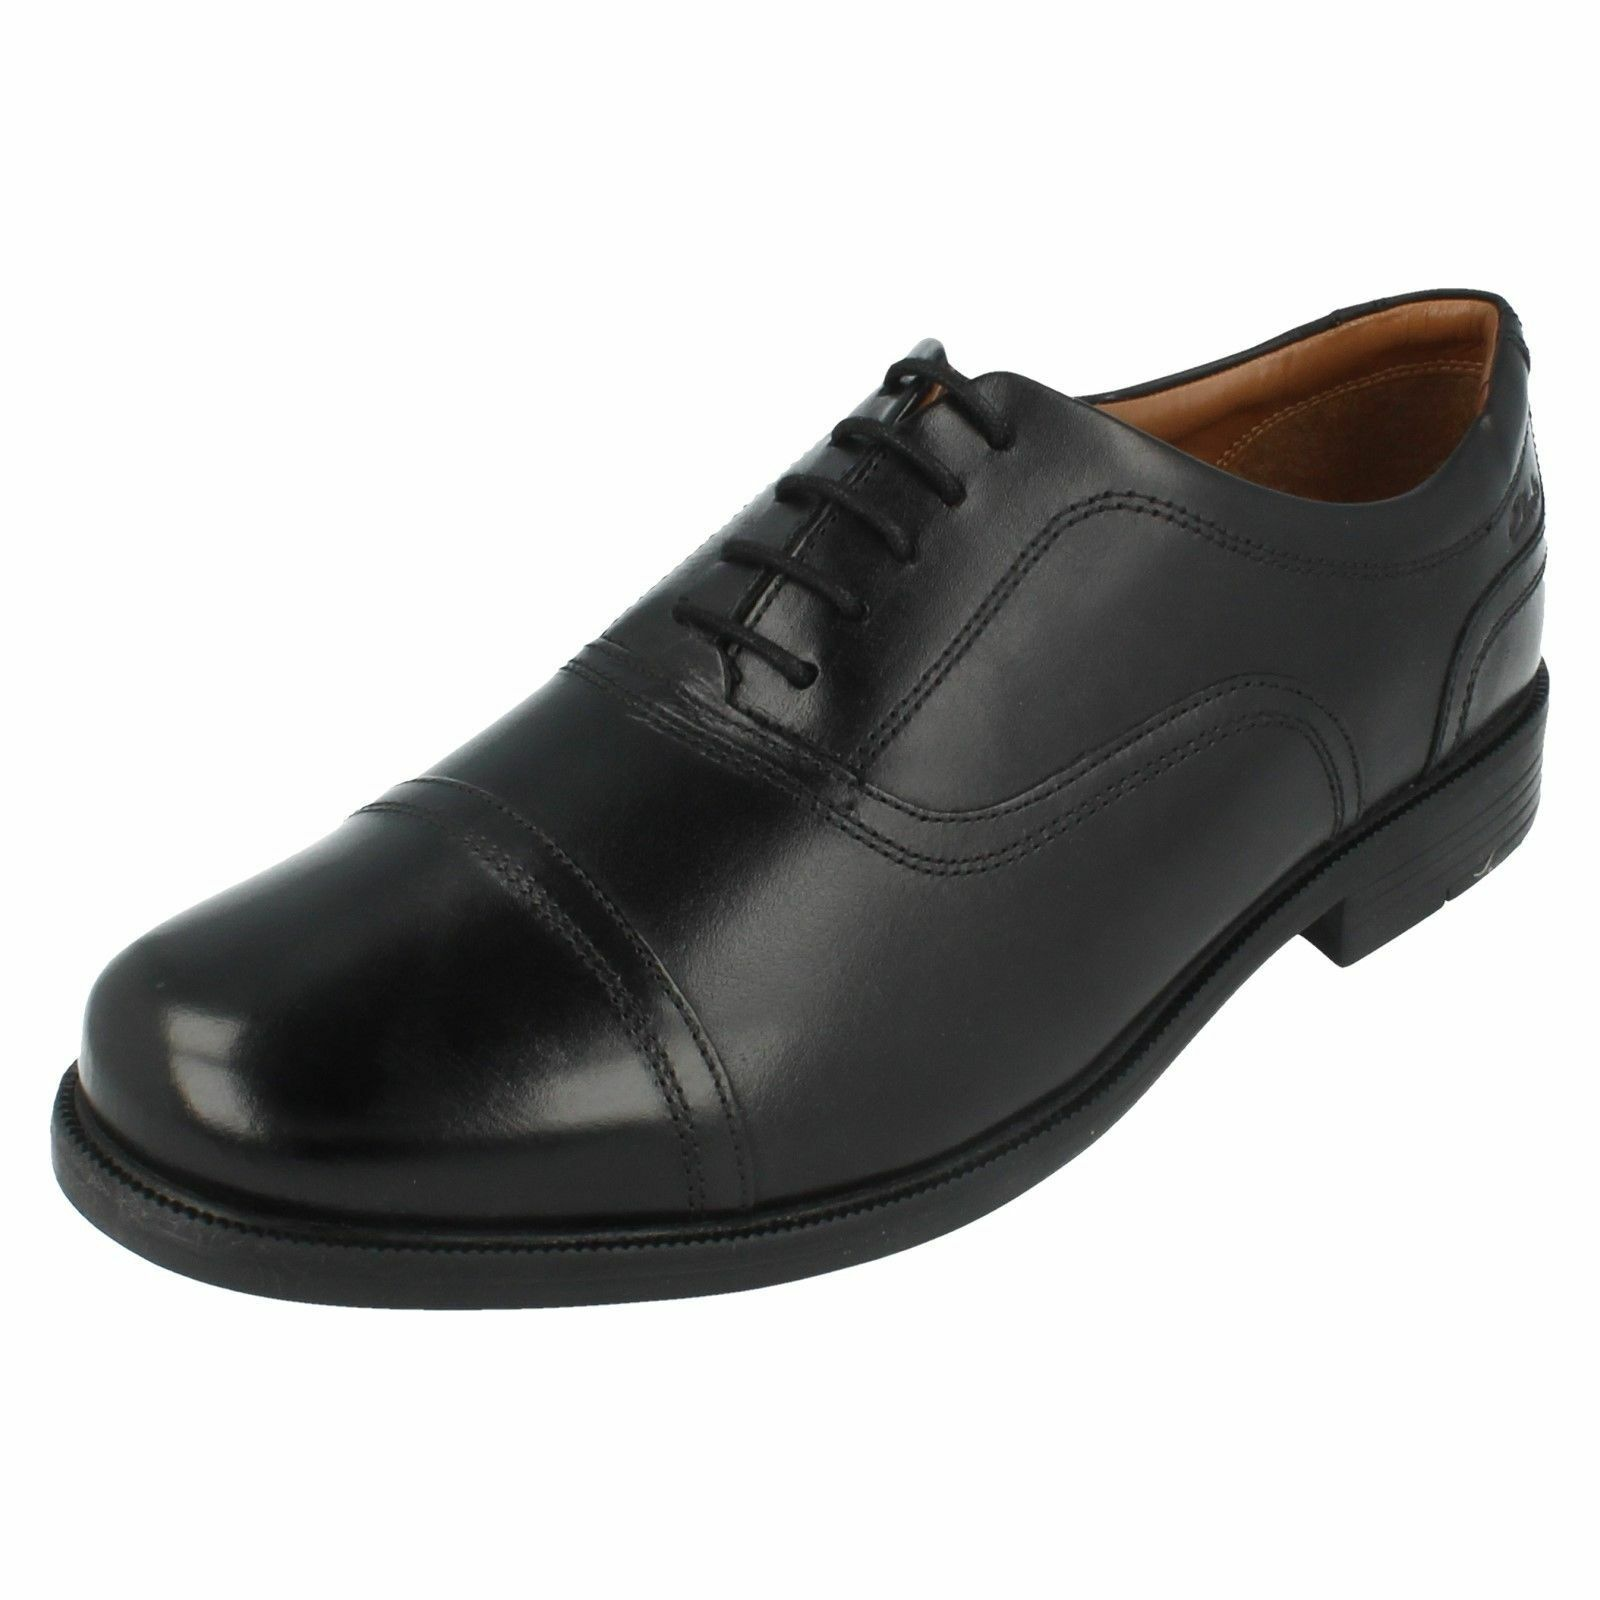 Uomo Up Beeston Cap4 Toe Cap Lace Up Uomo Schuhes By Clarks e12e97